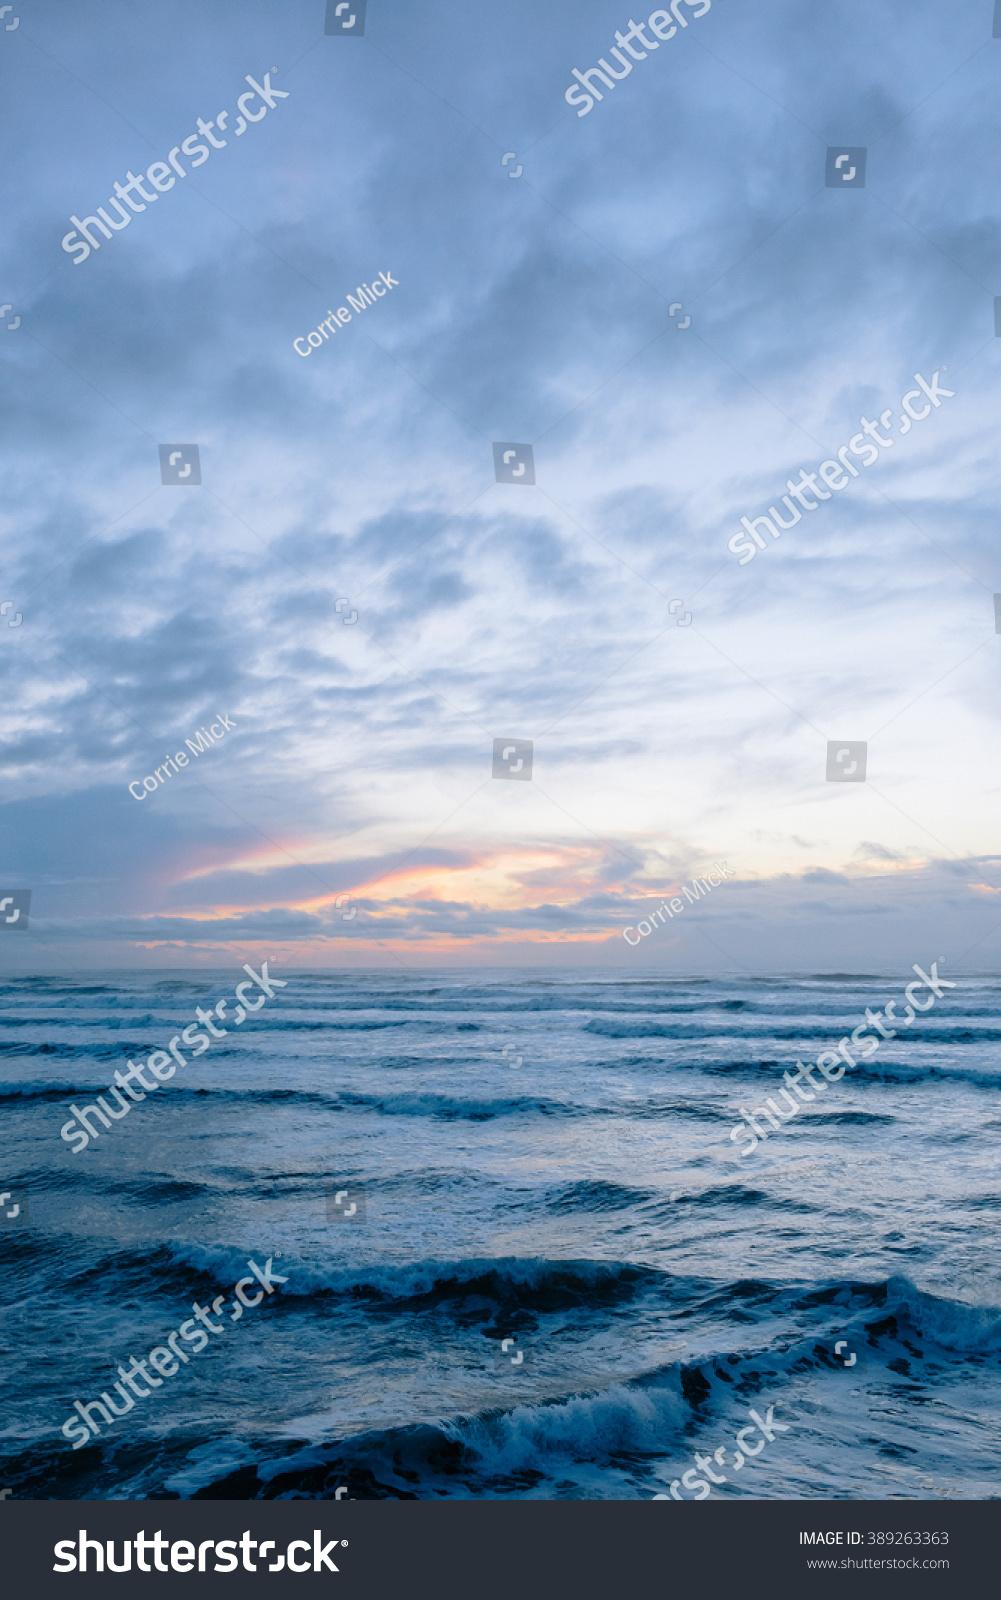 Pacific Ocean Waves Dusk Stock Photo 389263363 - Shutterstock Pacific Ocean Waves